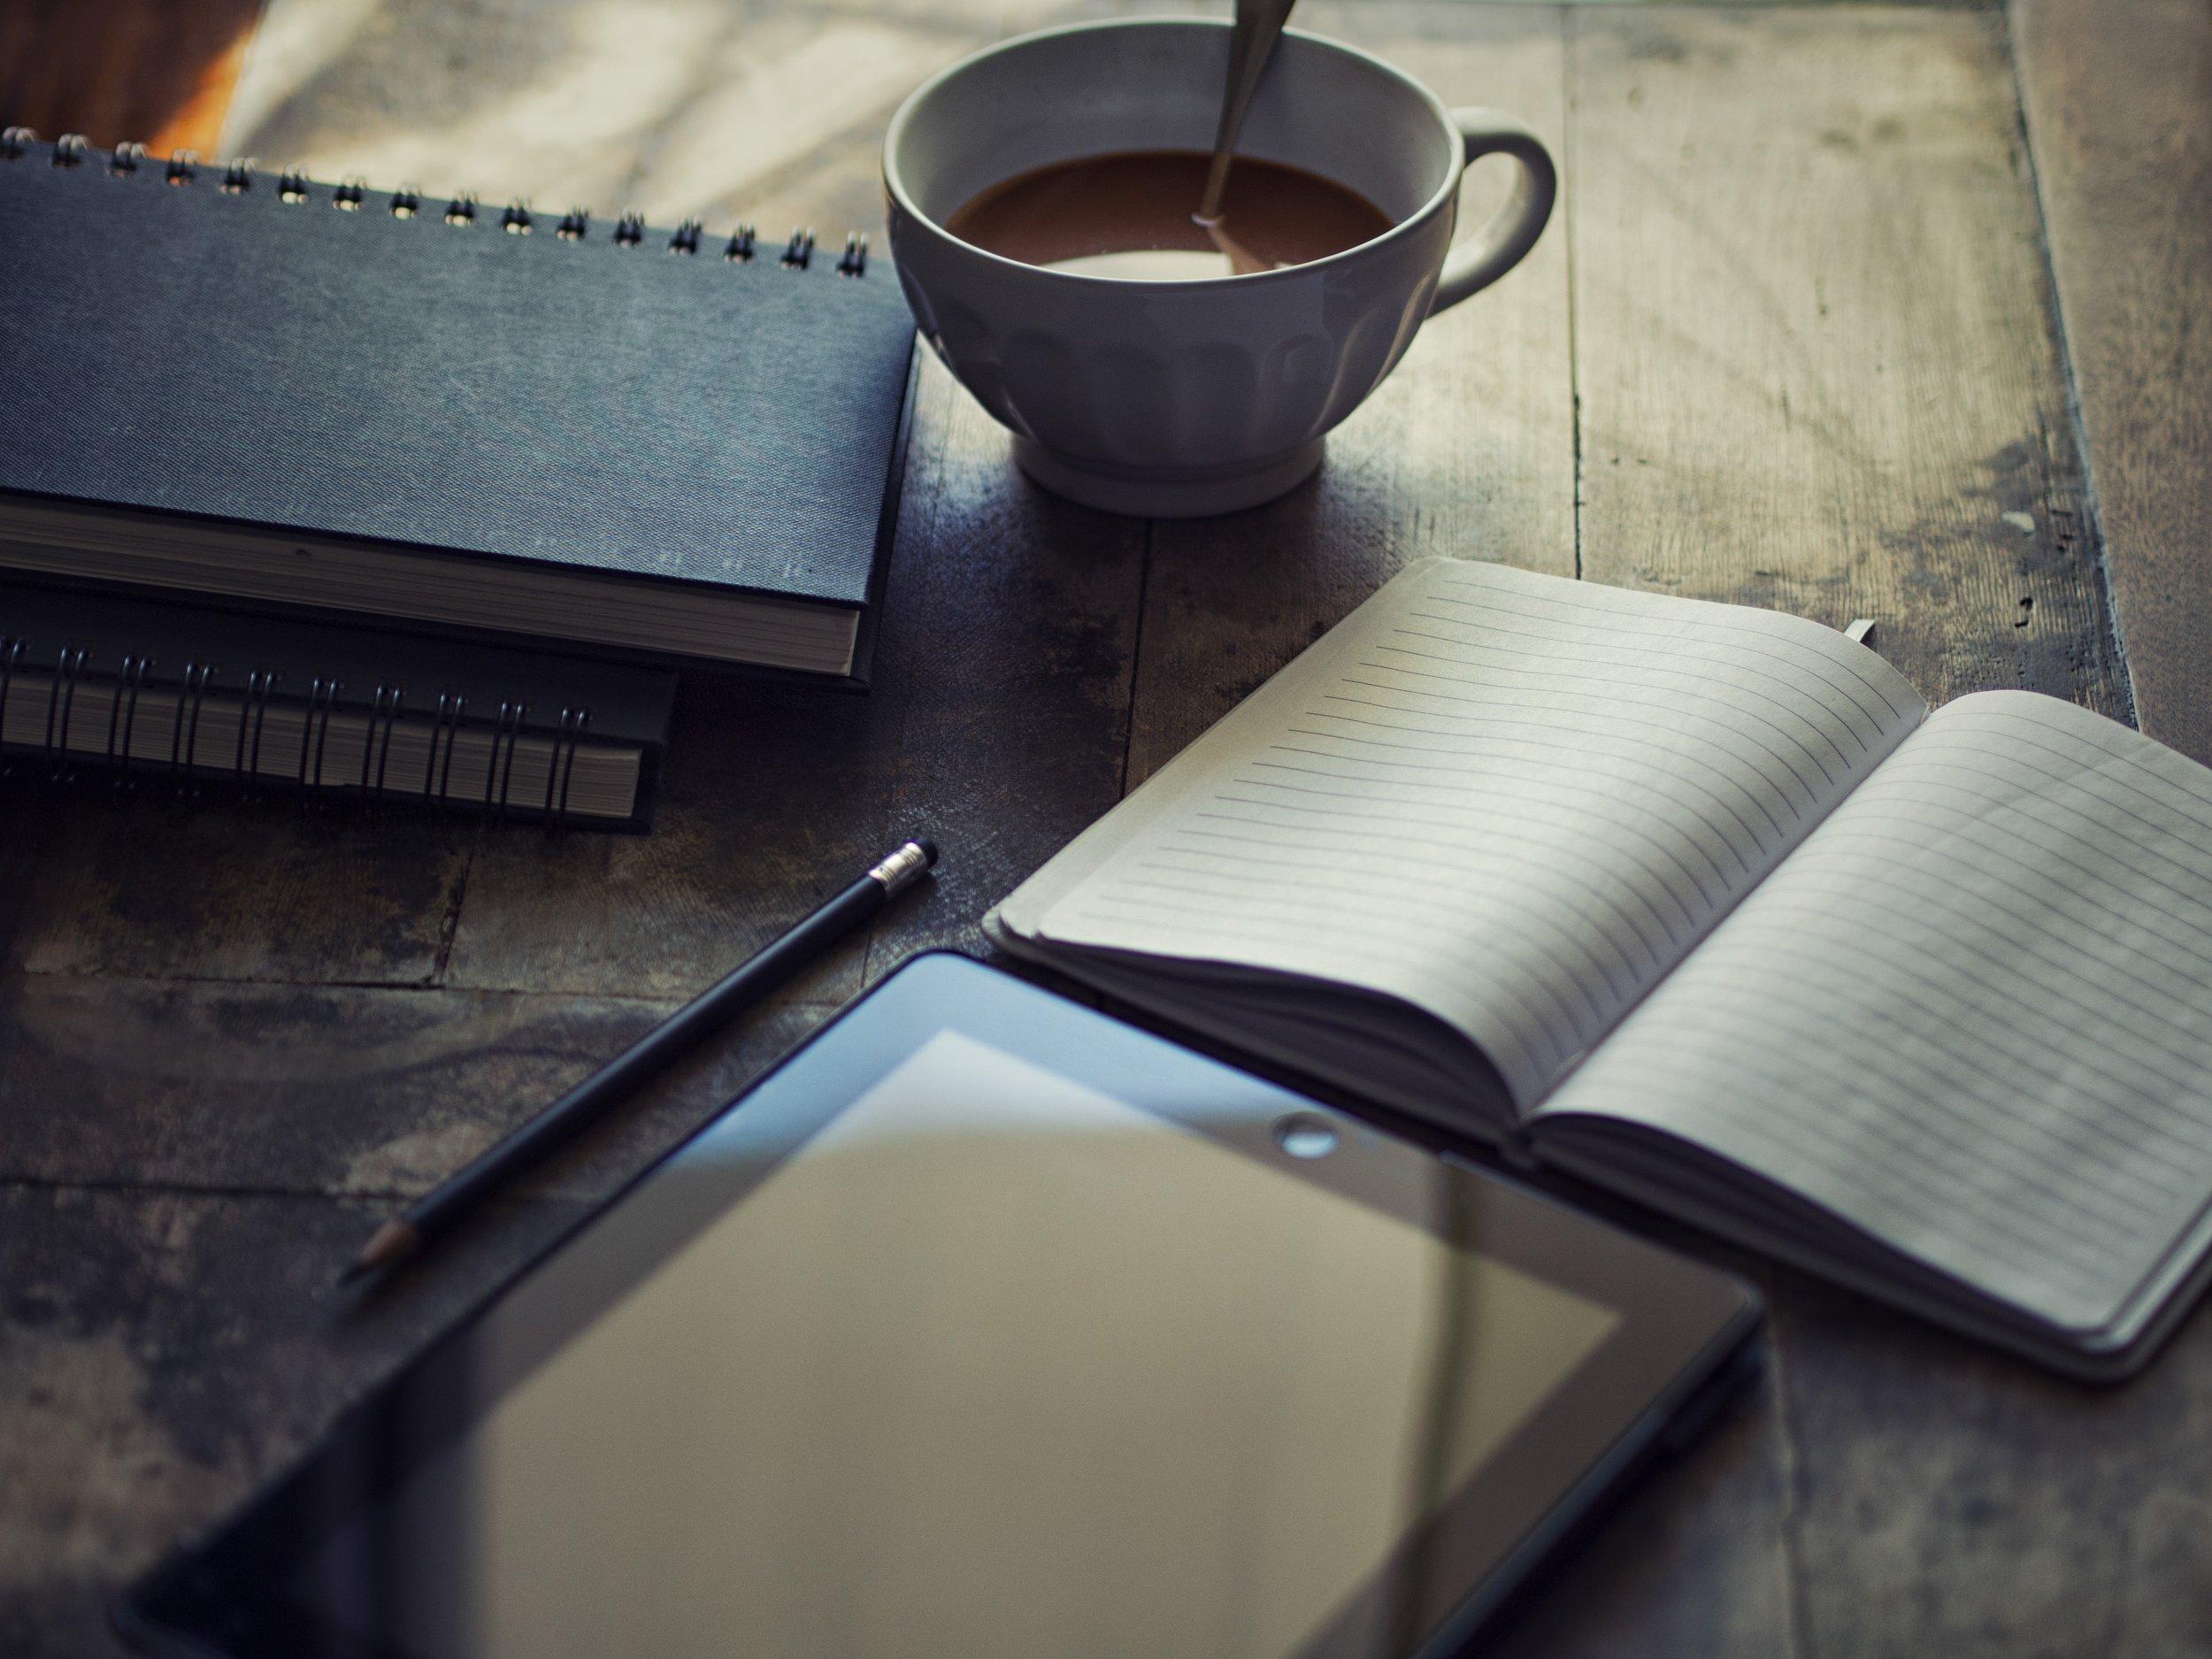 Memoir Writing Workshop - Give your memories new life through storytelling